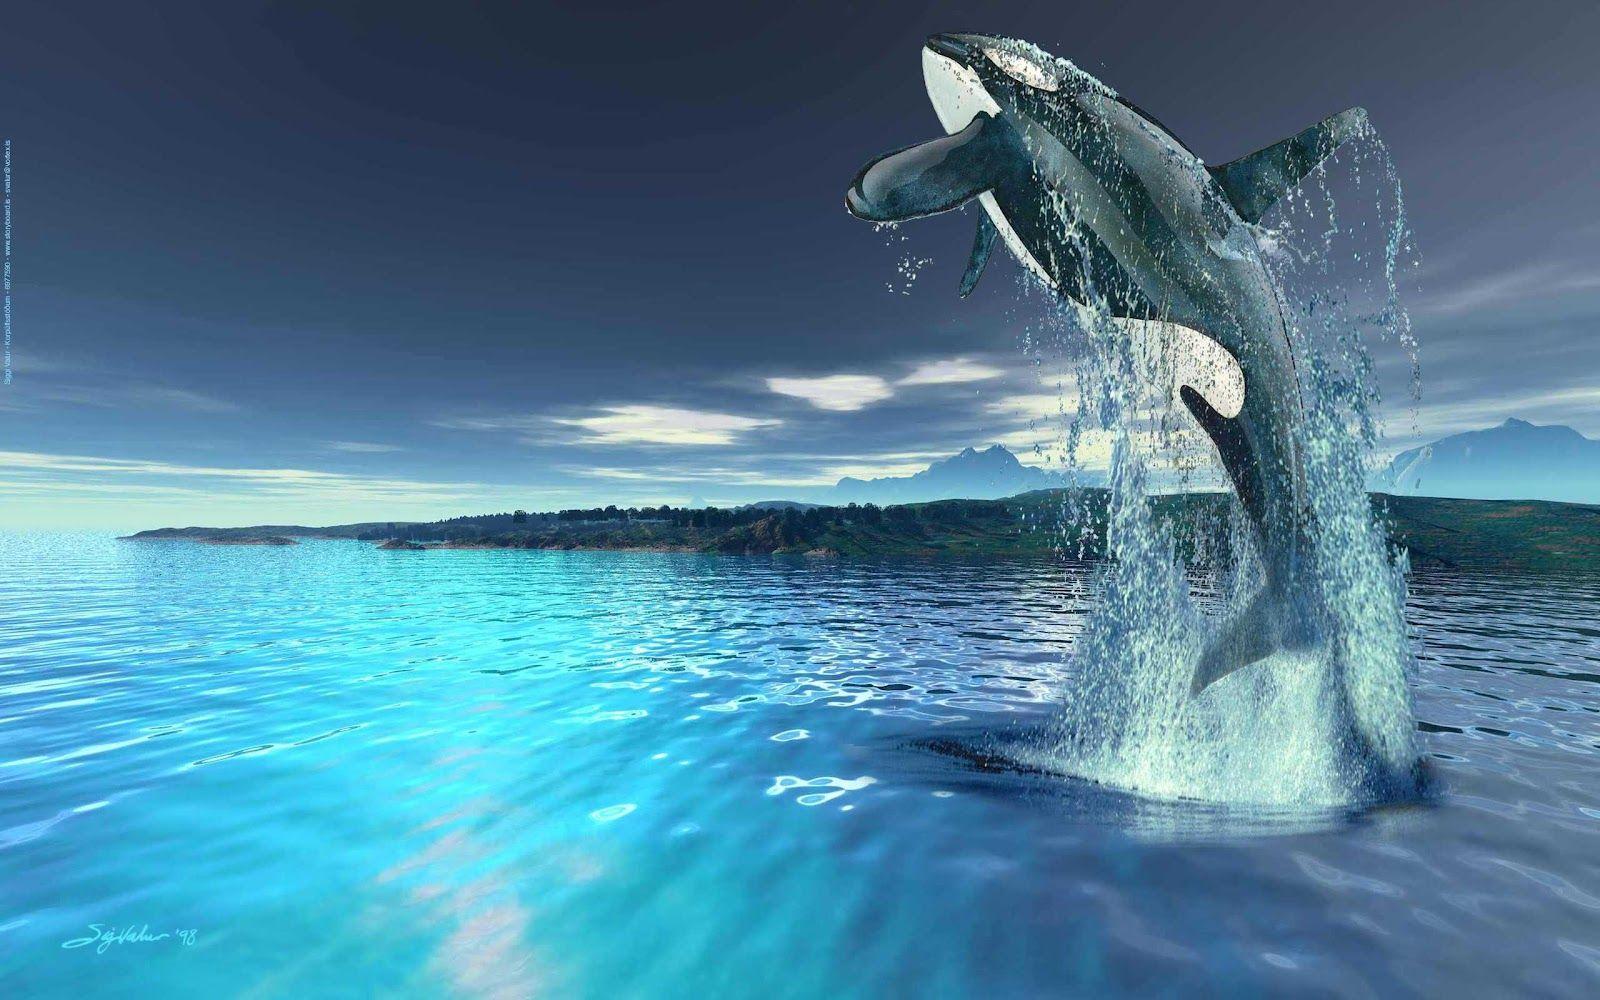 whales photographs hd